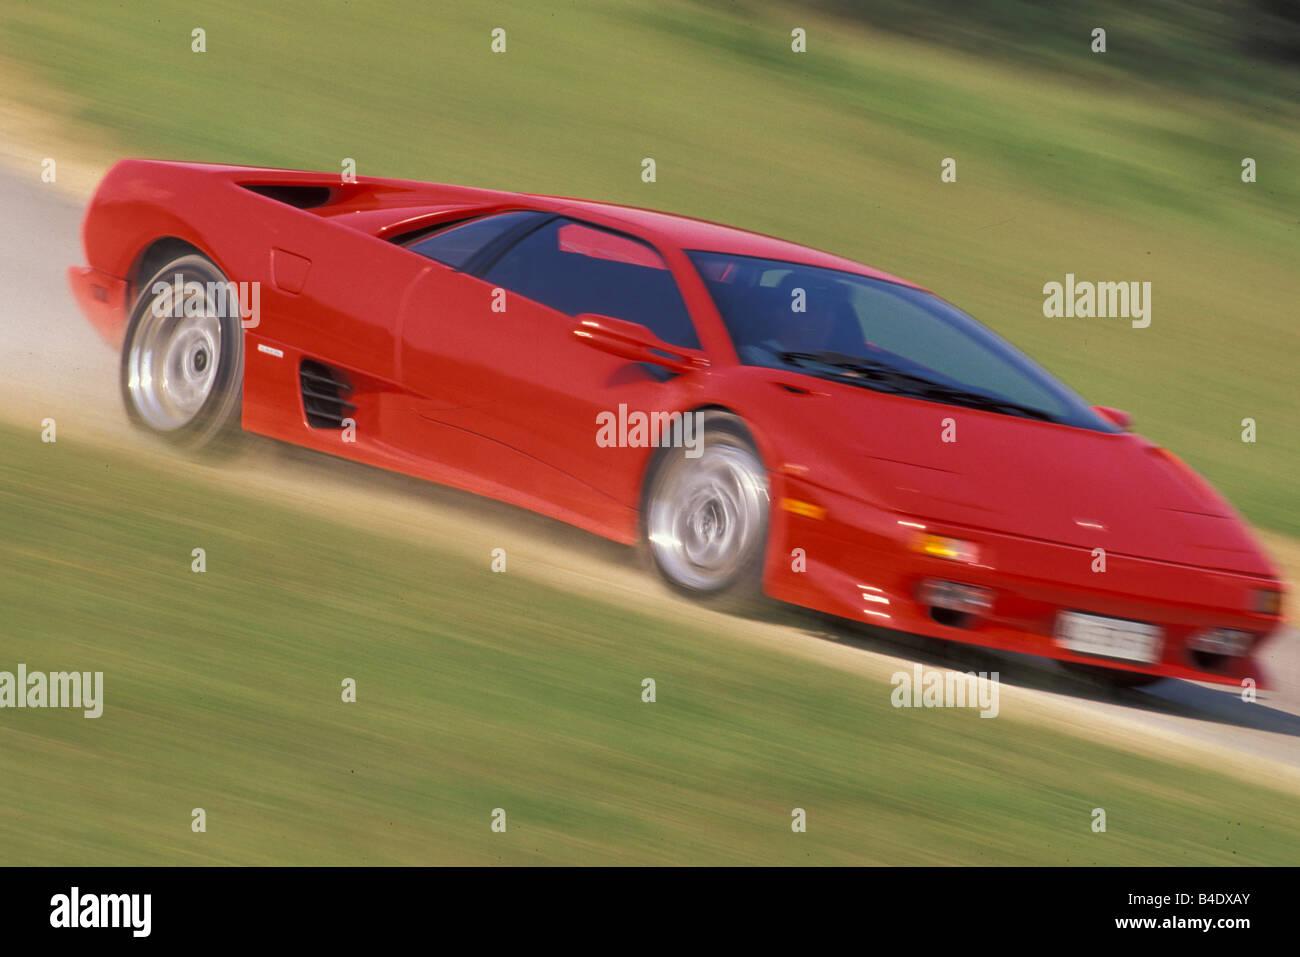 Car Lamborghini Diablo Vt Coupe Coupe Roadster Red Model Year